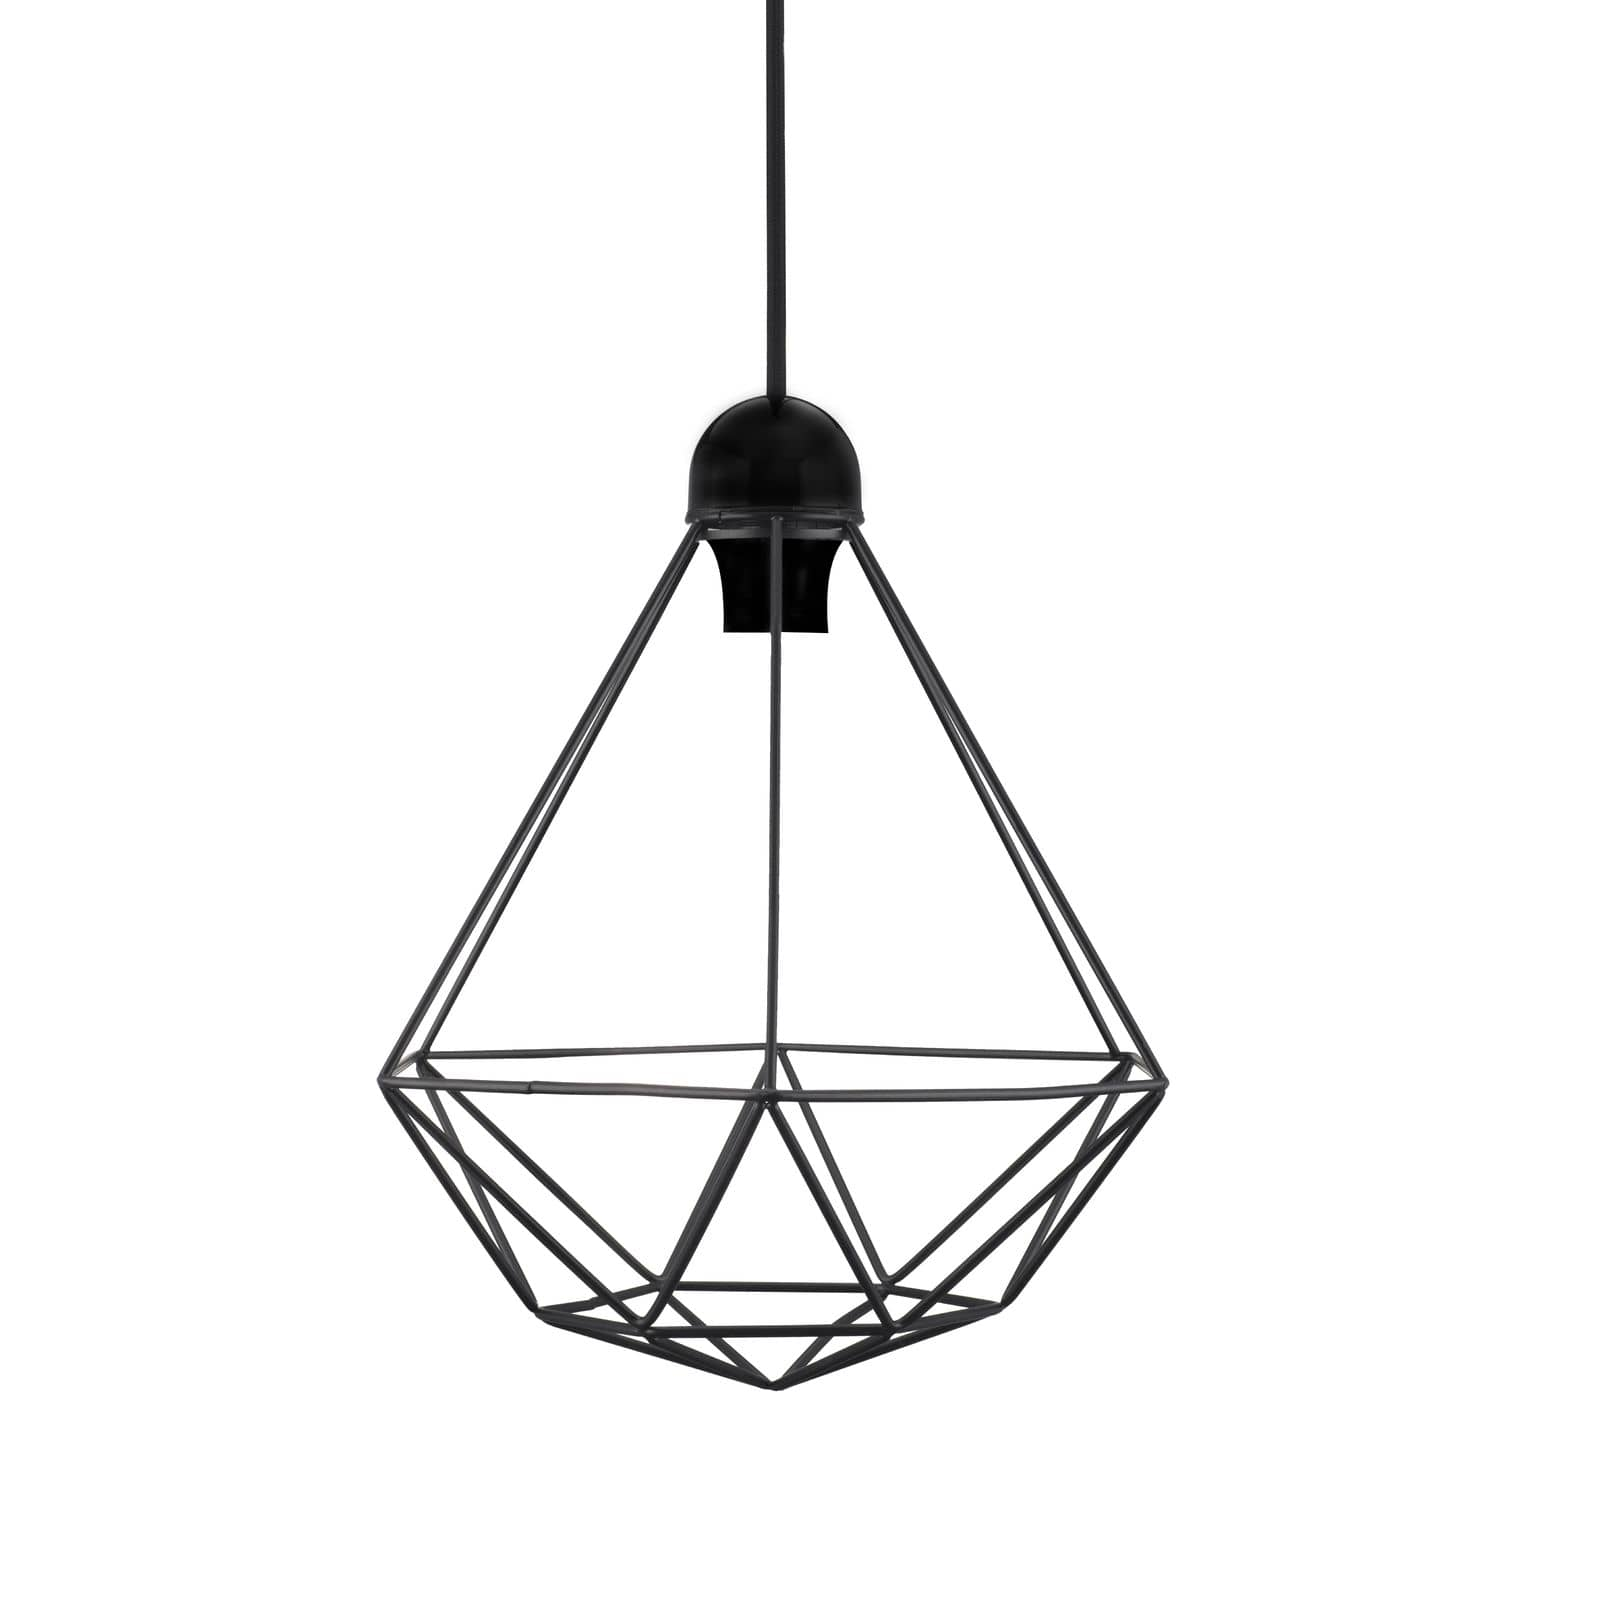 nordlux 84863003 tees minimalistische pendelleuchte e27 metall schwarz. Black Bedroom Furniture Sets. Home Design Ideas